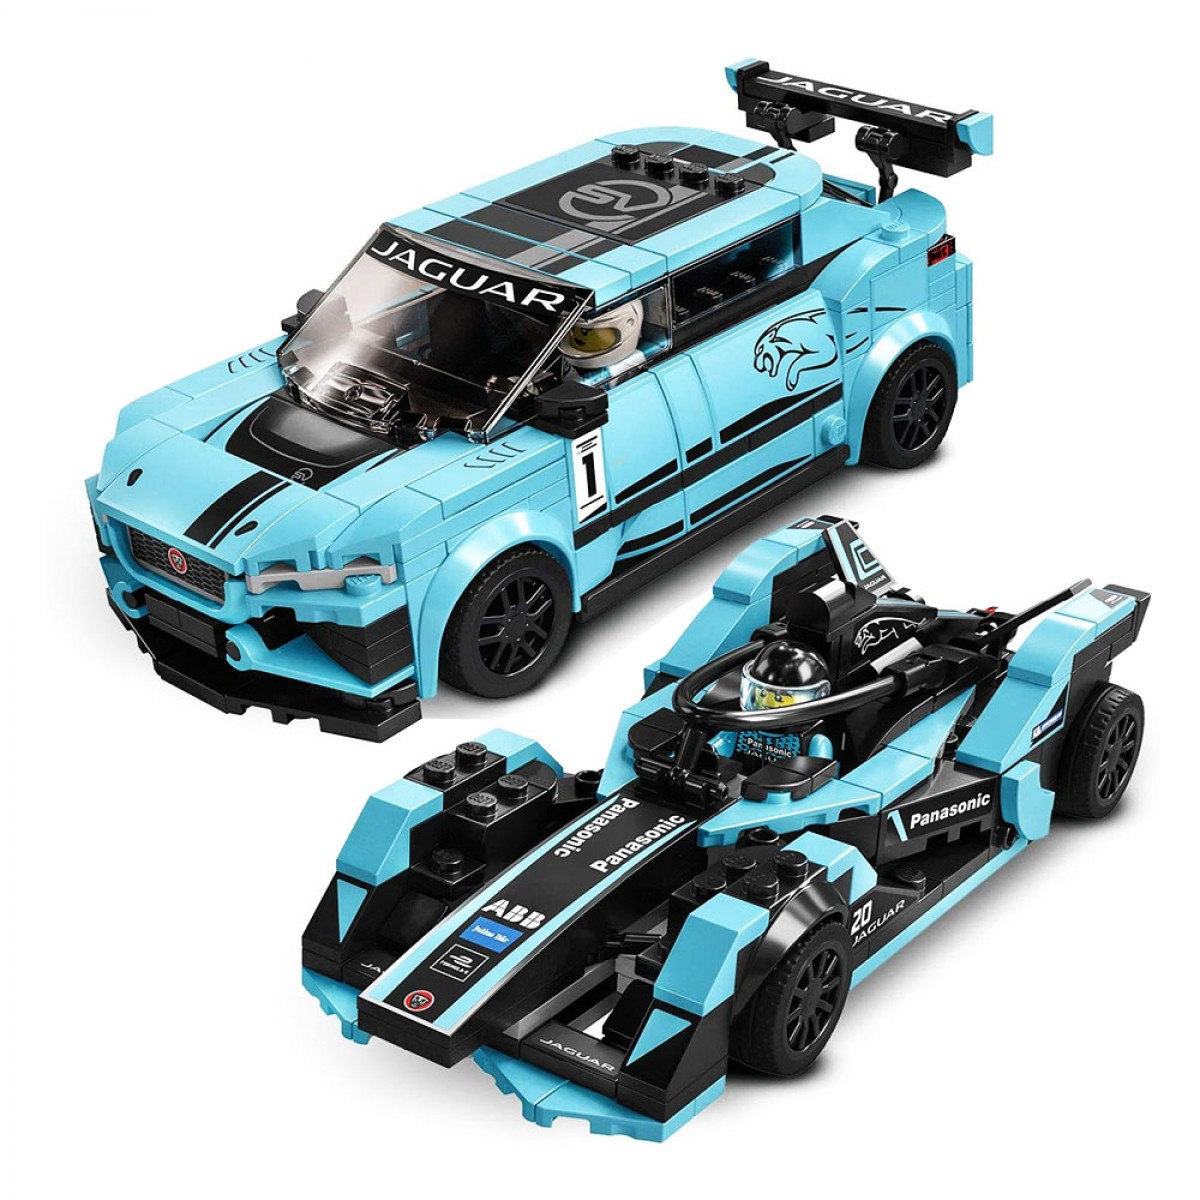 LEGO FORMULA E PANASONIC JAGUAR 76898